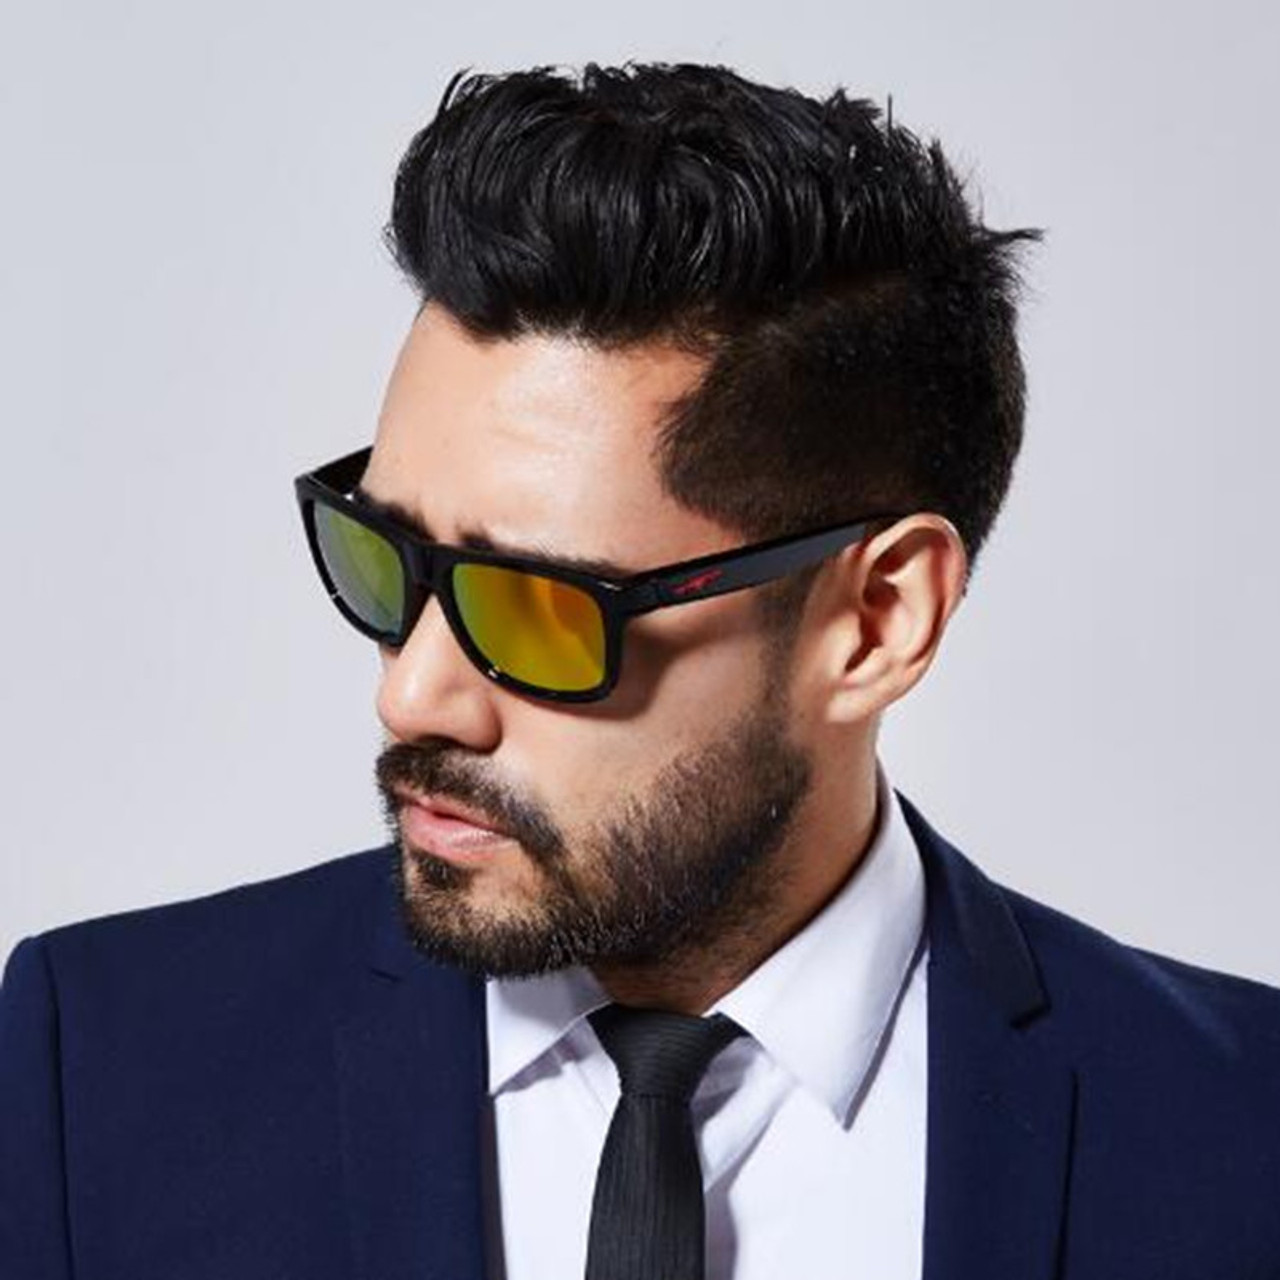 da598e208 ... 2018 Arnette Sunglasses Men Sun Glasses Driving UV400 Vintage Motion  Sunglass Women gafas de sol de ...